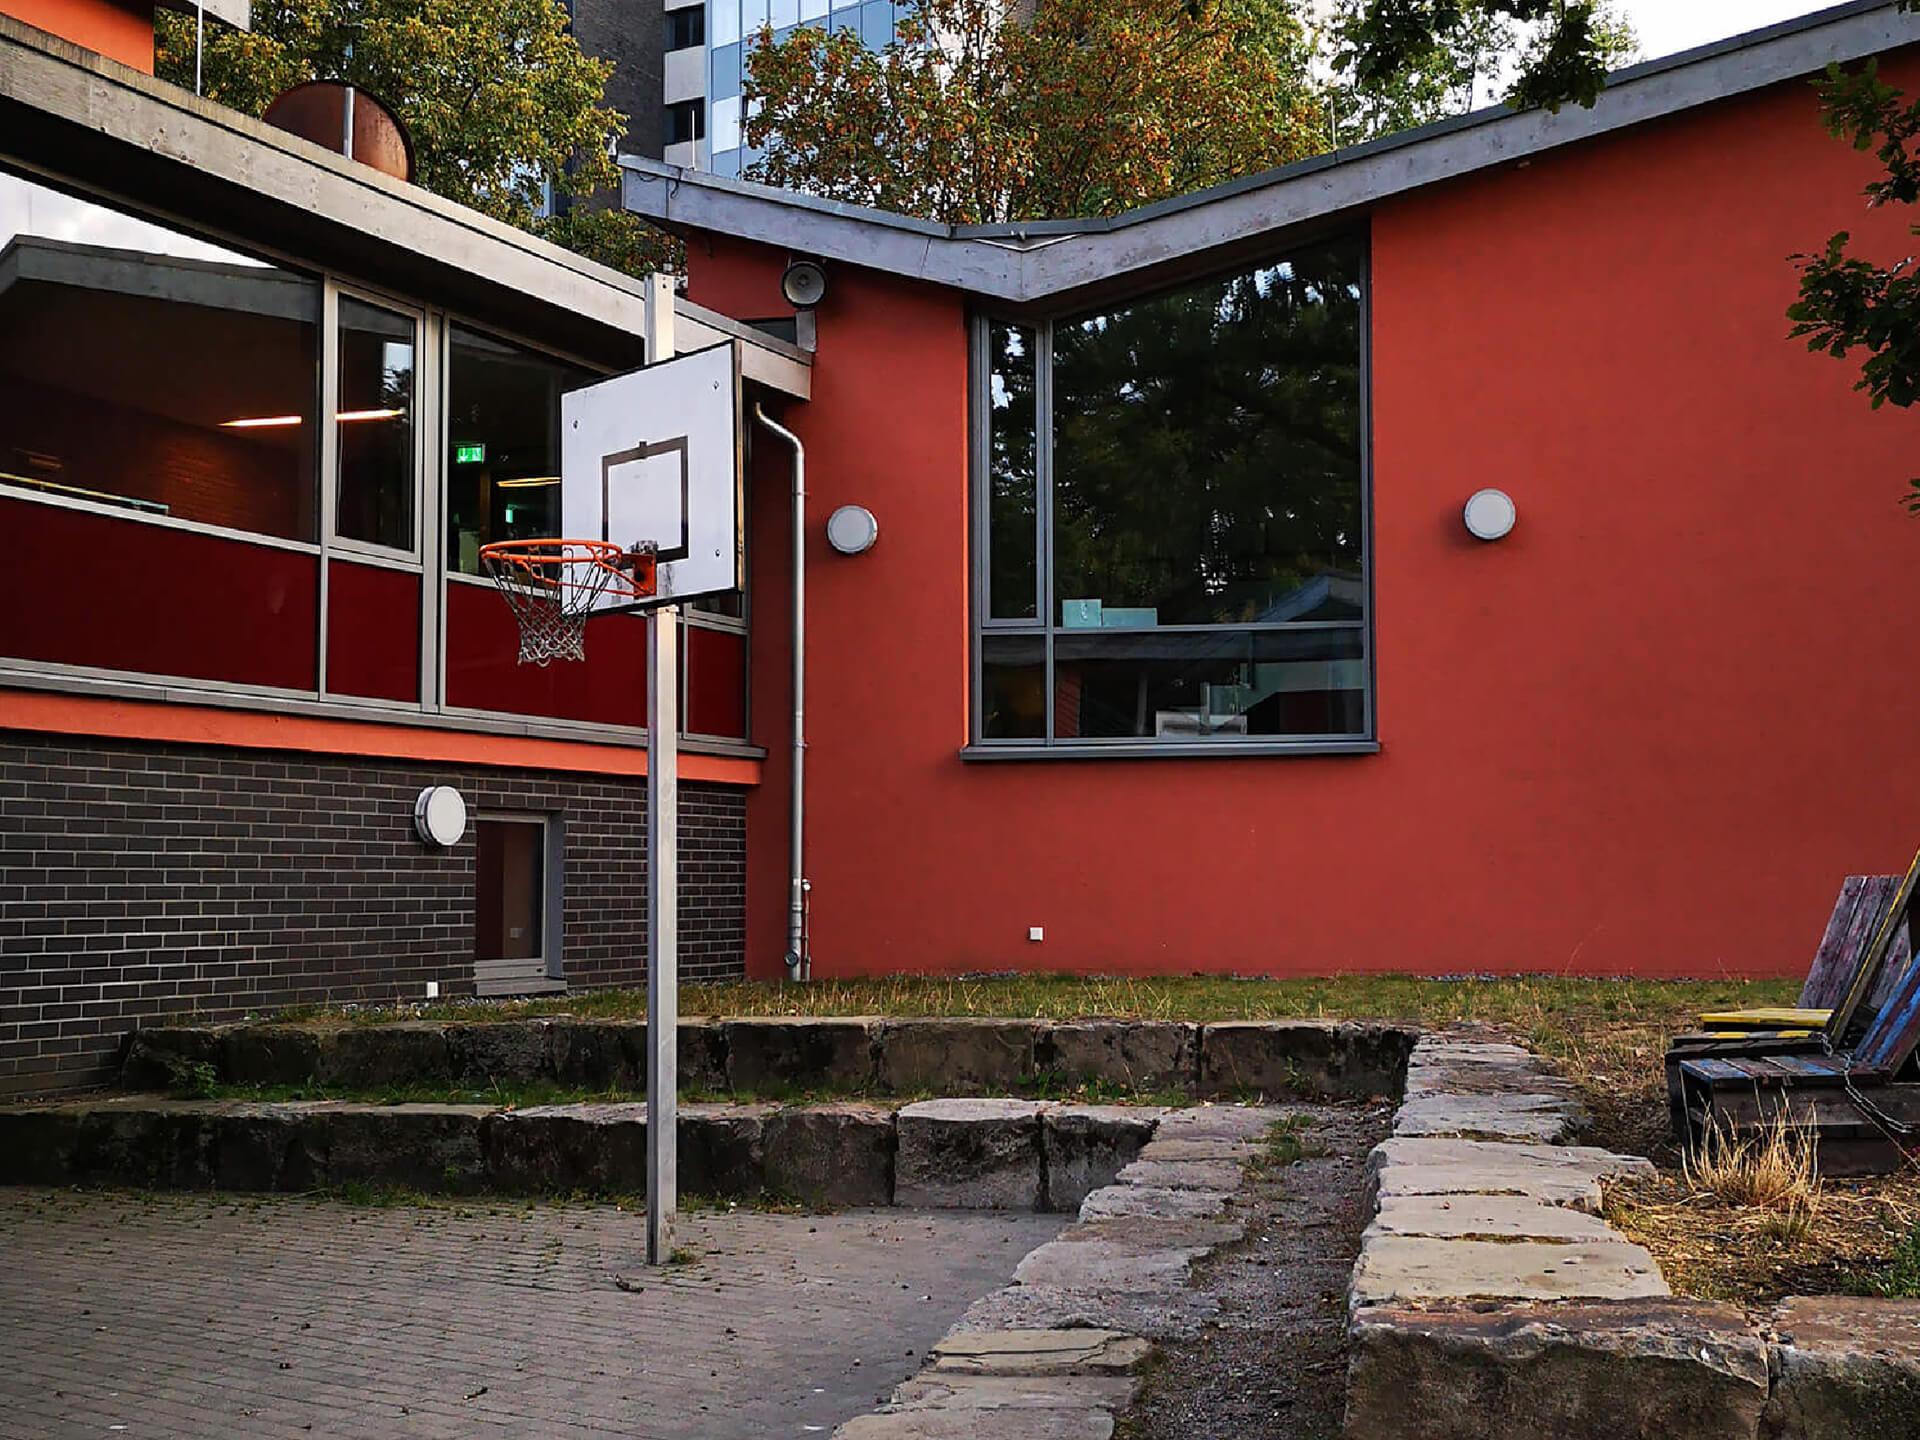 jugendzentrum-luna-sennestadt-jugendtreff-5-1